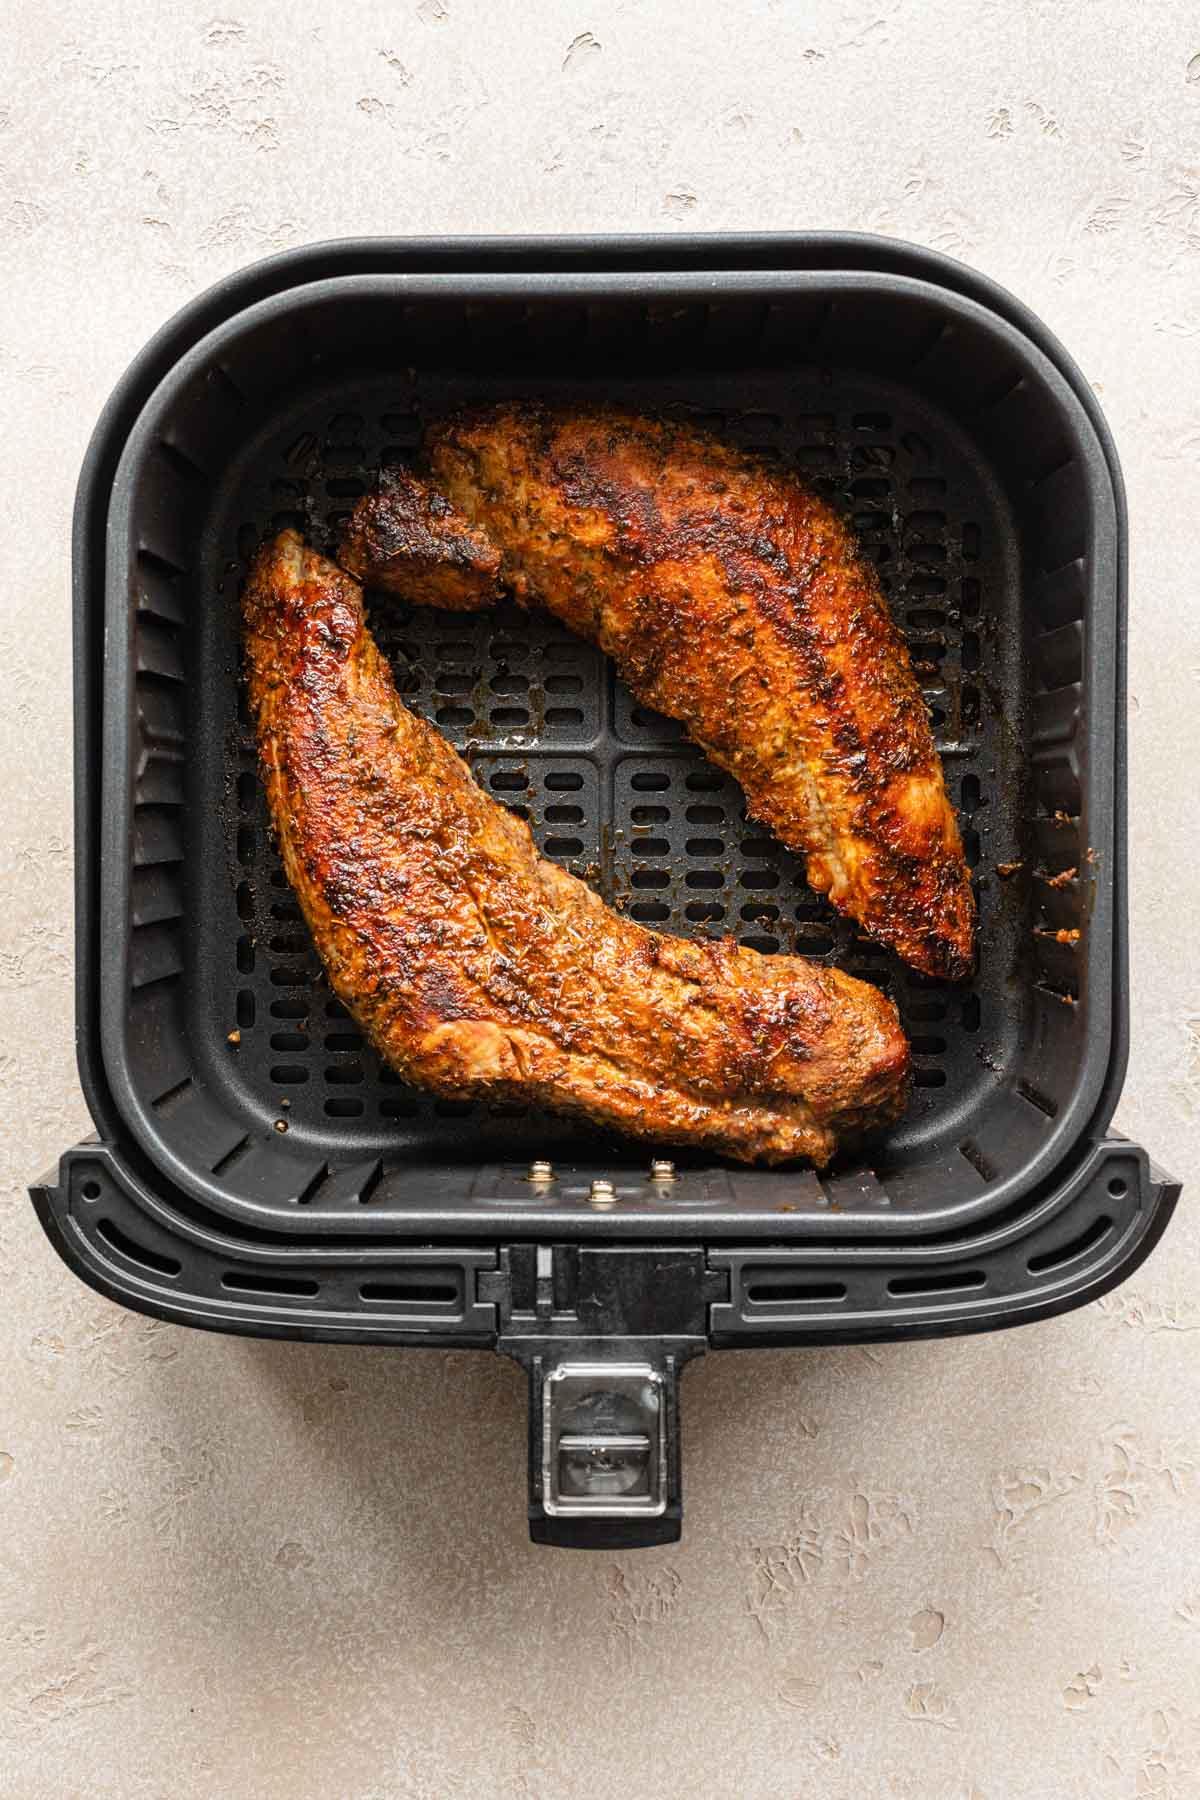 Two cooked pork tenderloins in an air fryer basket.